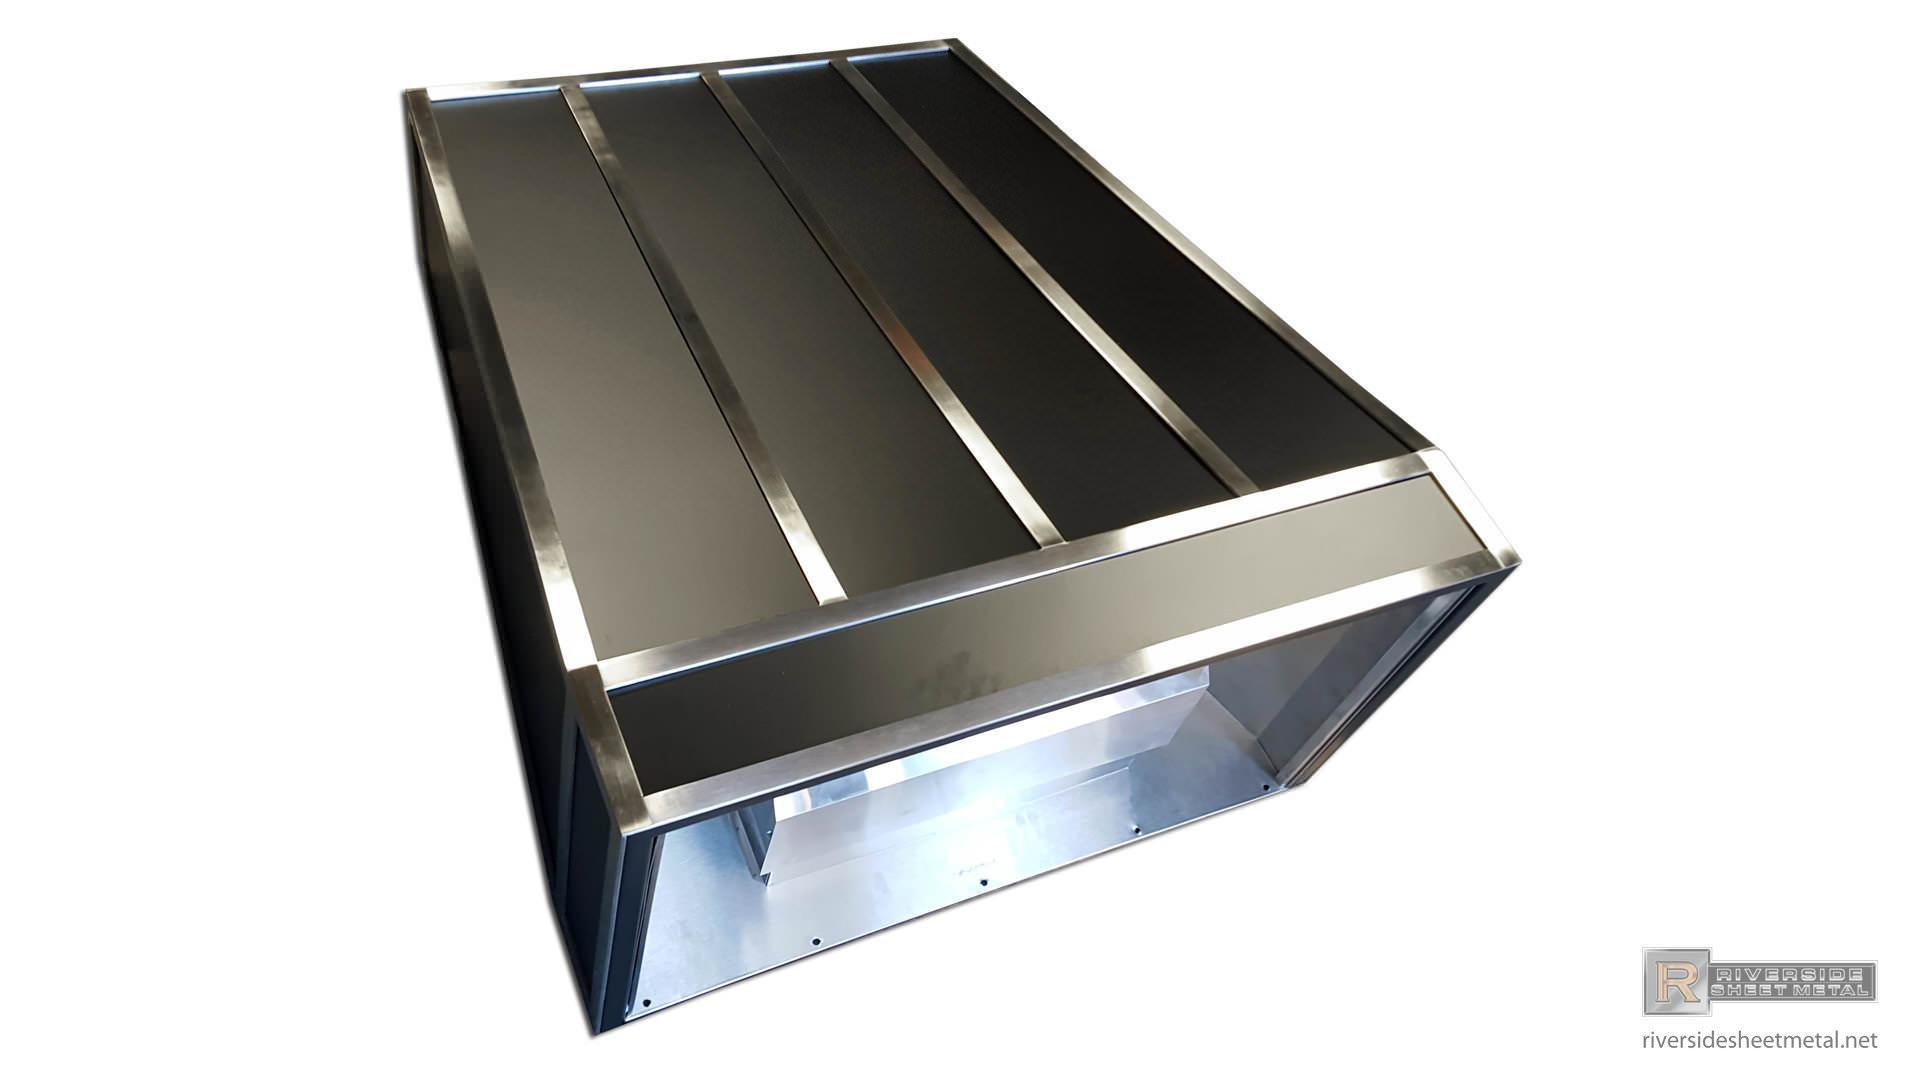 Hood Vents Range Hoods Copper Stainless Steel Brass